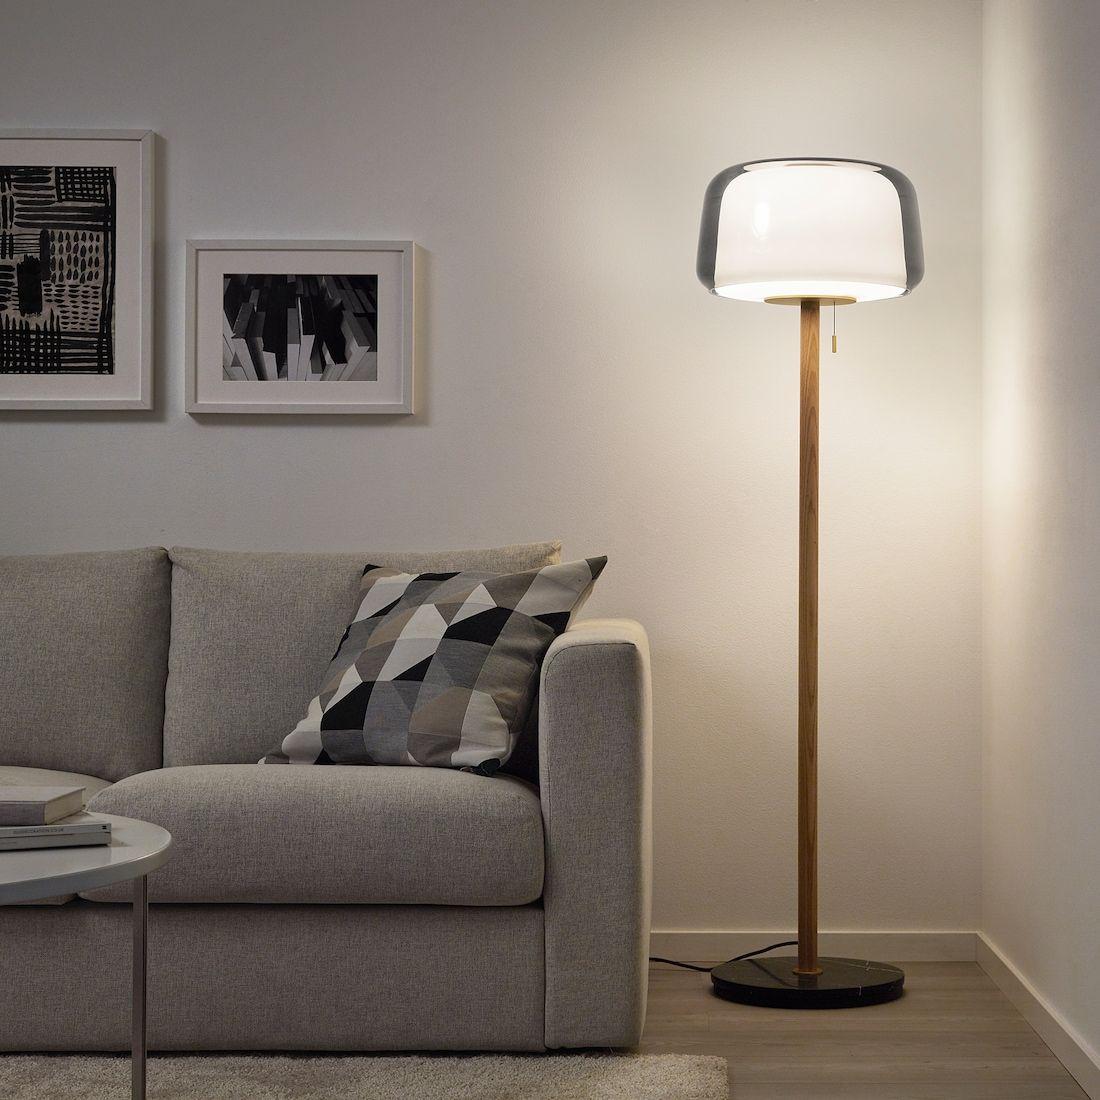 Evedal Floor Lamp Grey Marble Grey Ikea In 2020 Floor Lamp Grey Floor Lamp Lamp